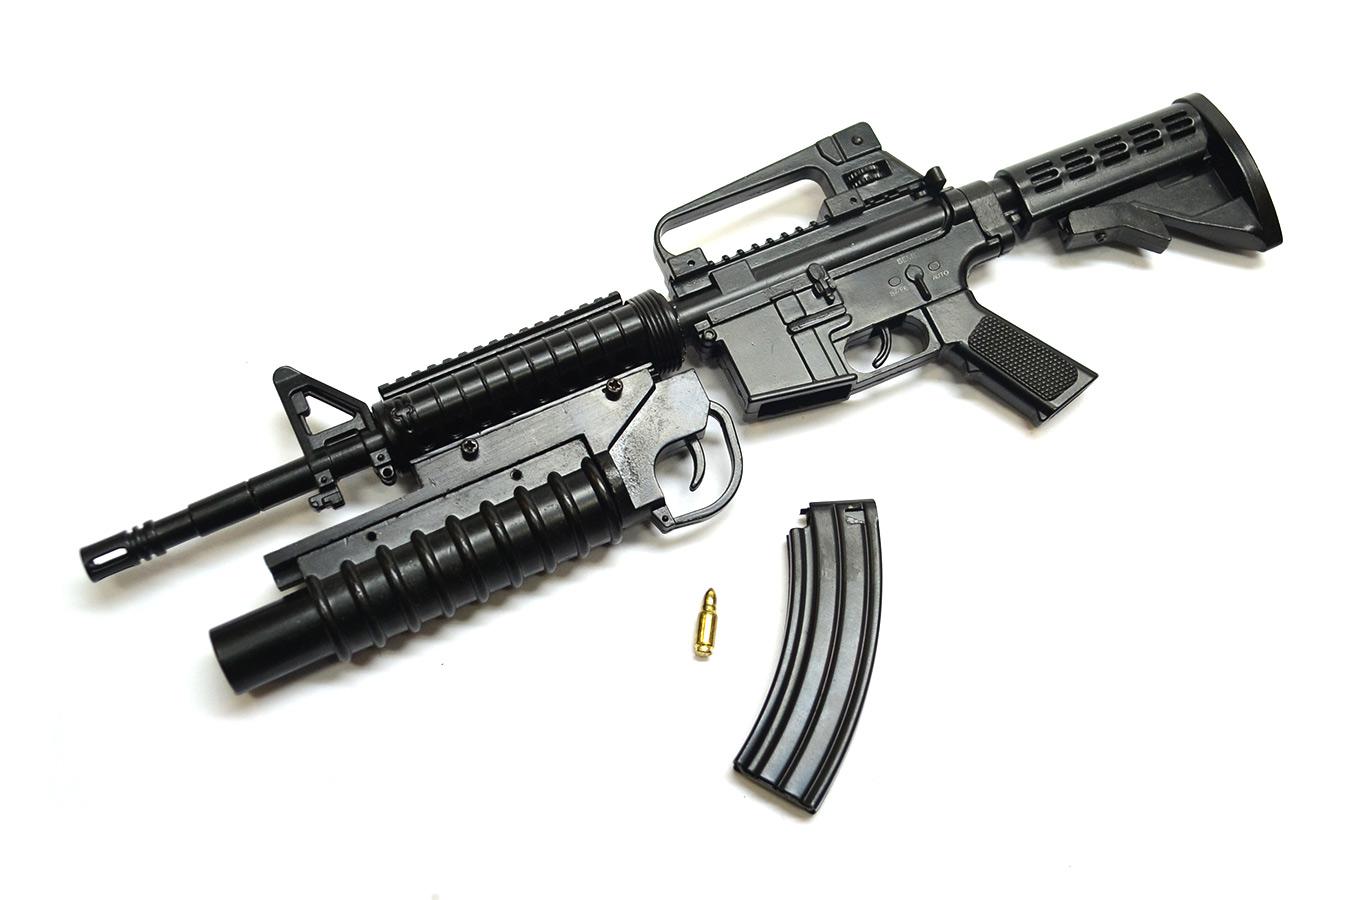 Макет автоматического карабина Colt M4A1 в масштабе 1:3